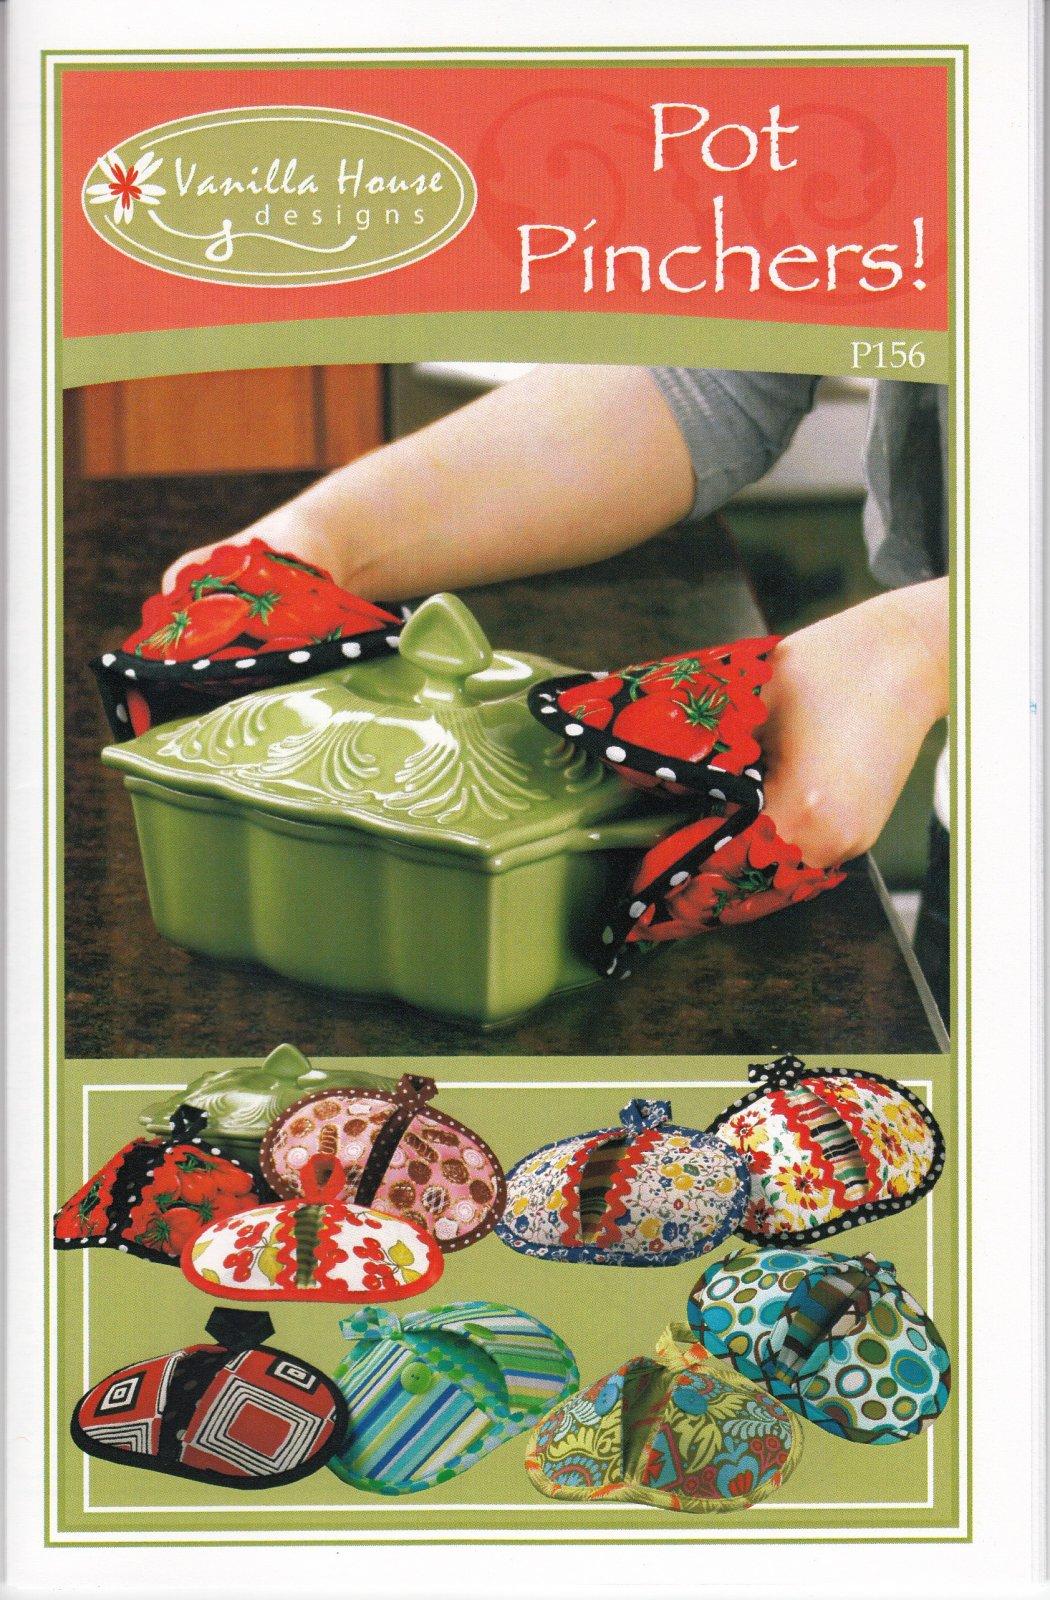 Pot Pinchers